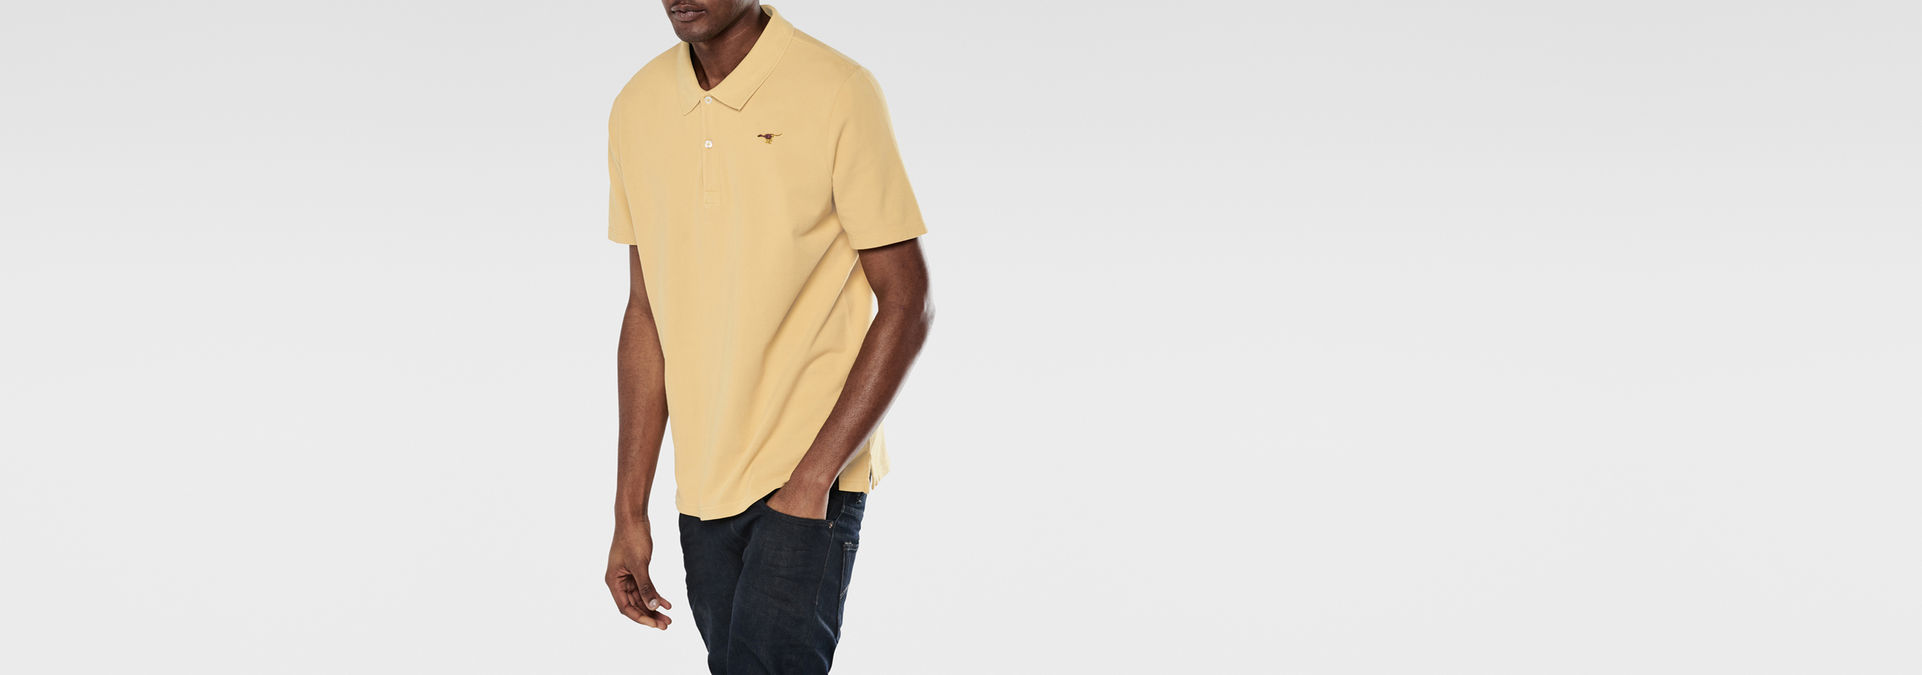 G-Star Raw Mens Nuelik Short-Sleeve Polo Shirt